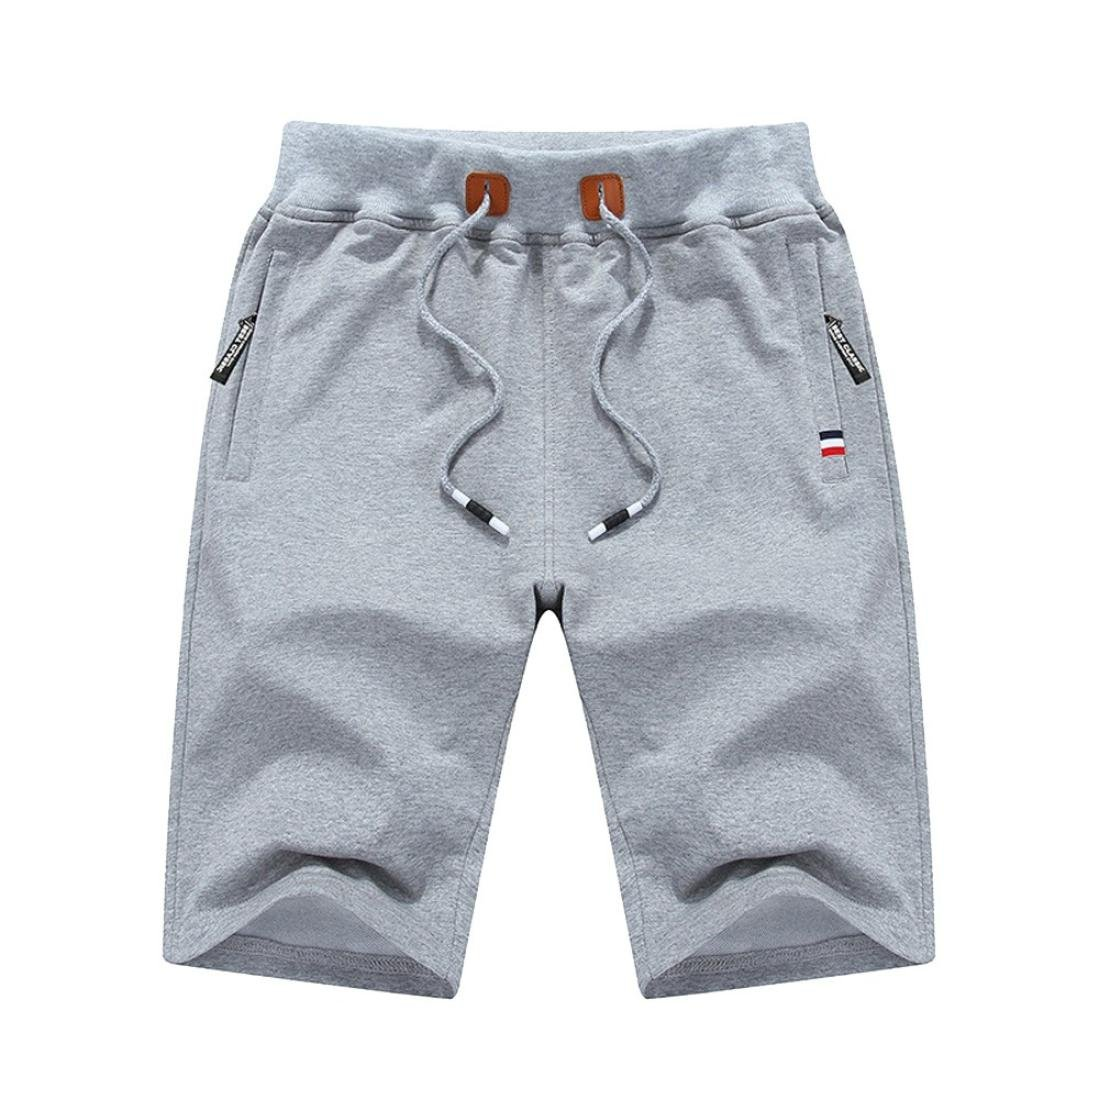 Realdo Men's Solid Shorts, Fashion Casual Zipper Pockets and Slim-Fit Style Pants(Grey,Medium)